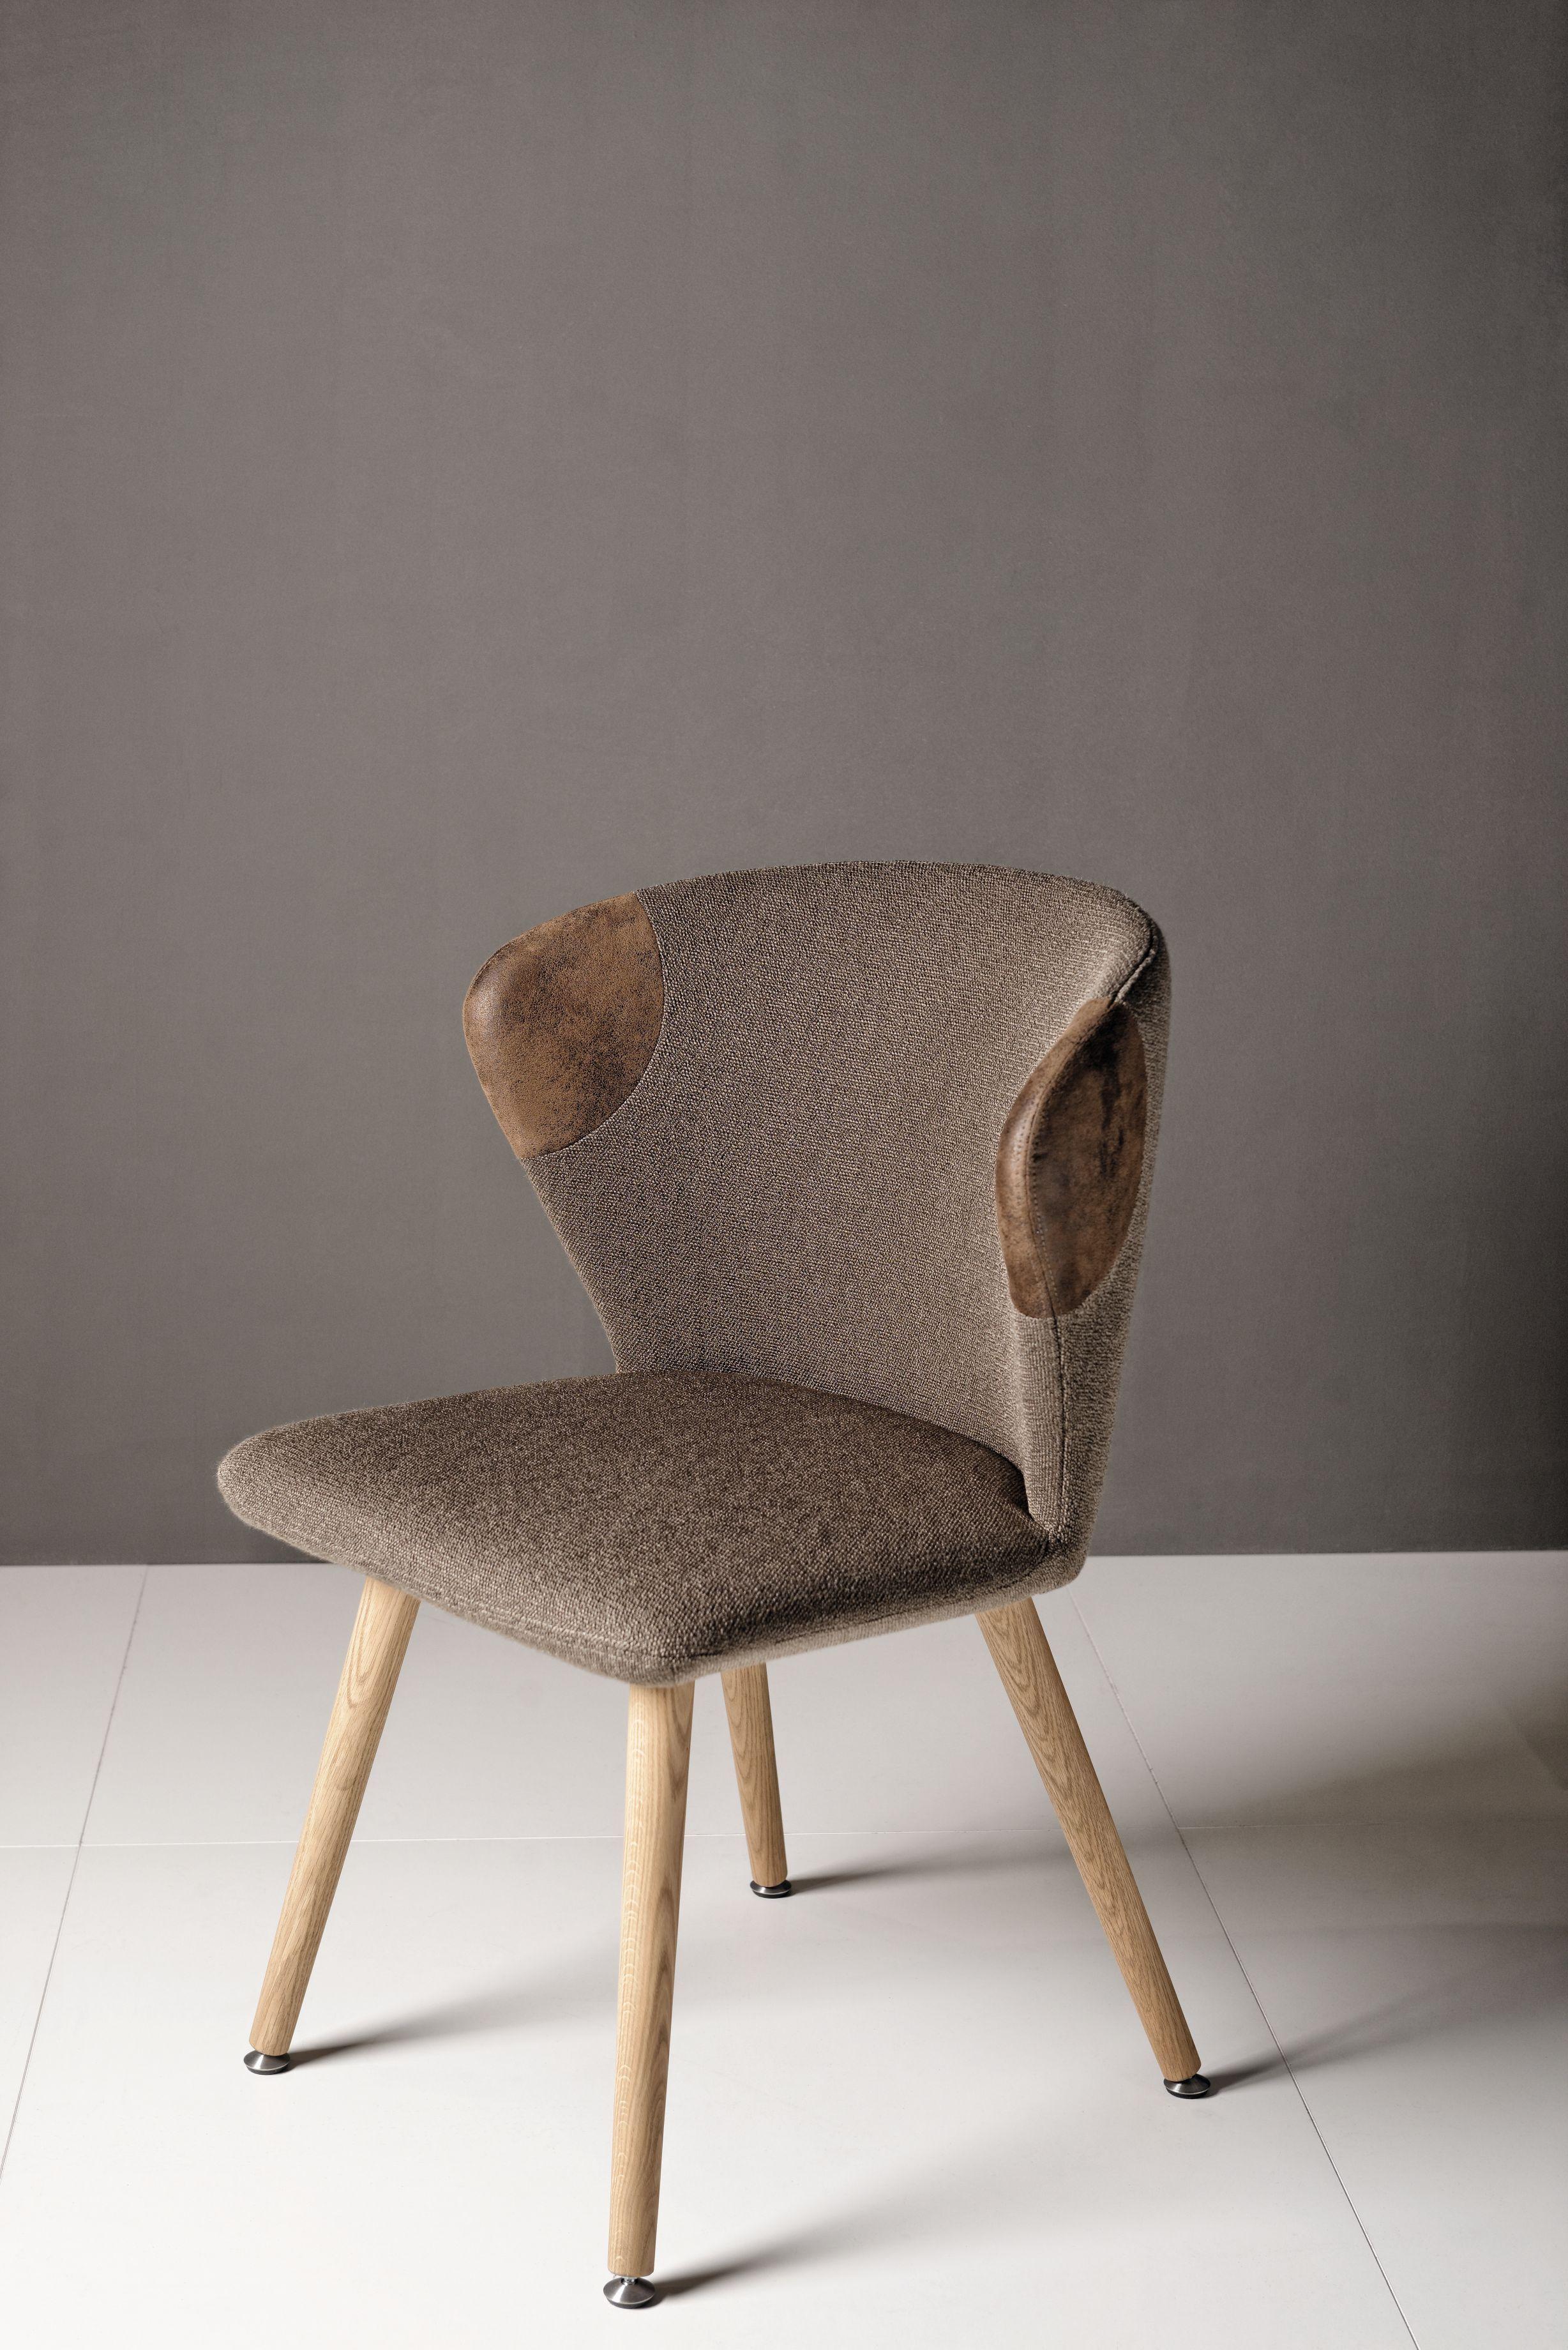 Voglauer V Alpin Tisch Stuhl Design Kiste De Stuhl Design Voglauer Stuhle